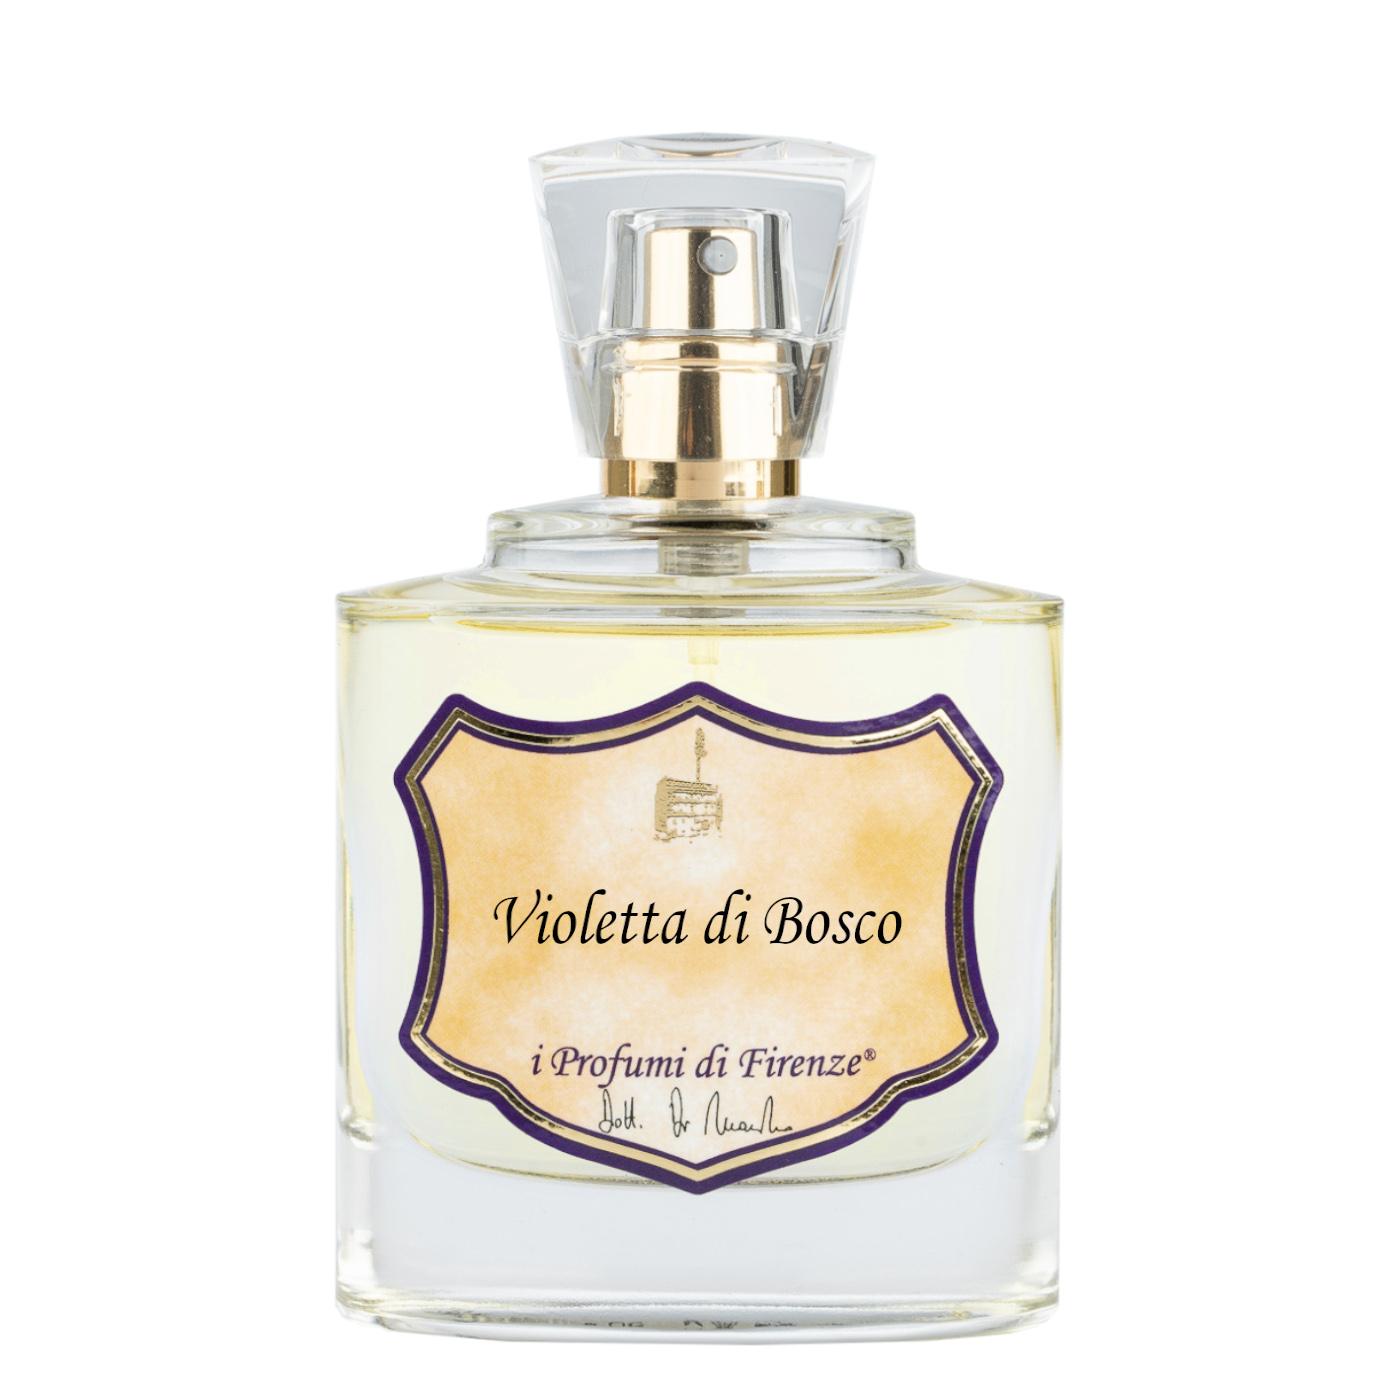 VIOLETTA DI BOSCO - Eau de Parfum-0